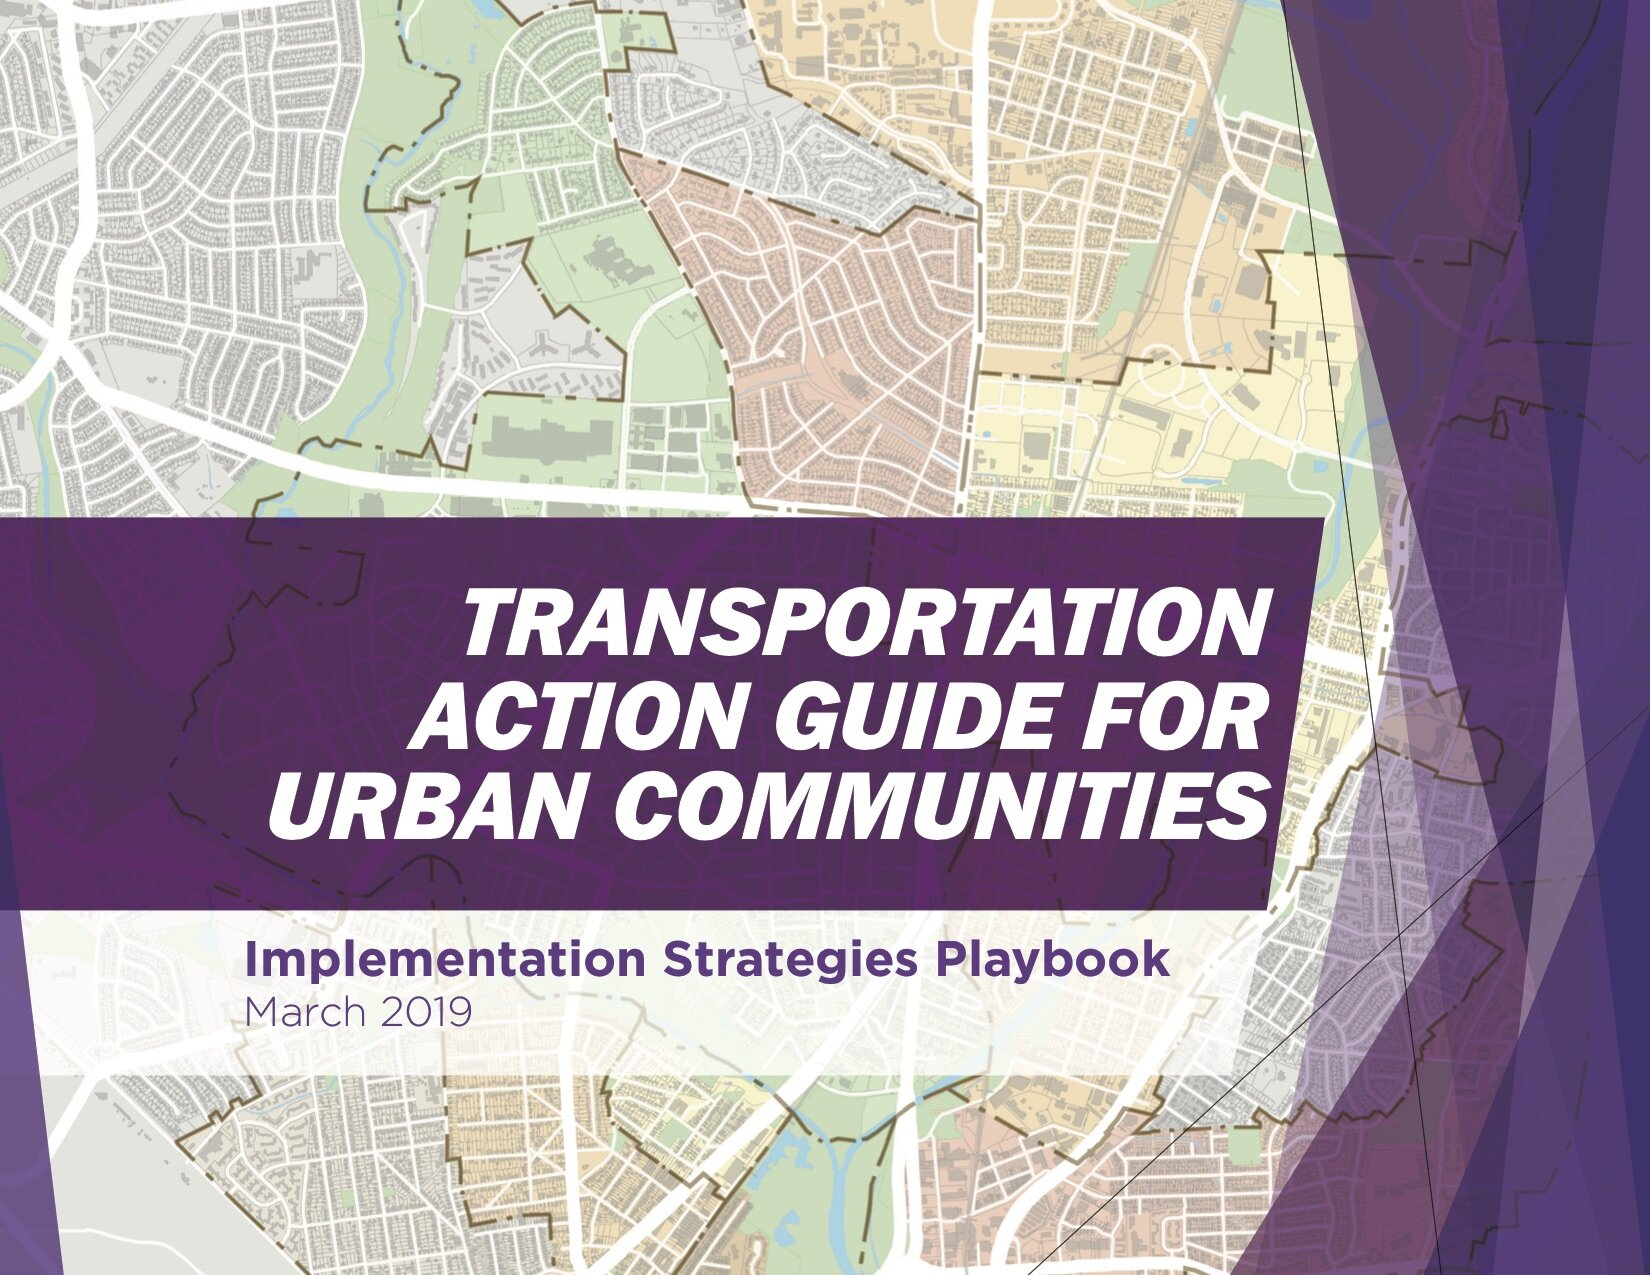 Transportation Action Guide for Urban Communities FINAL.jpg